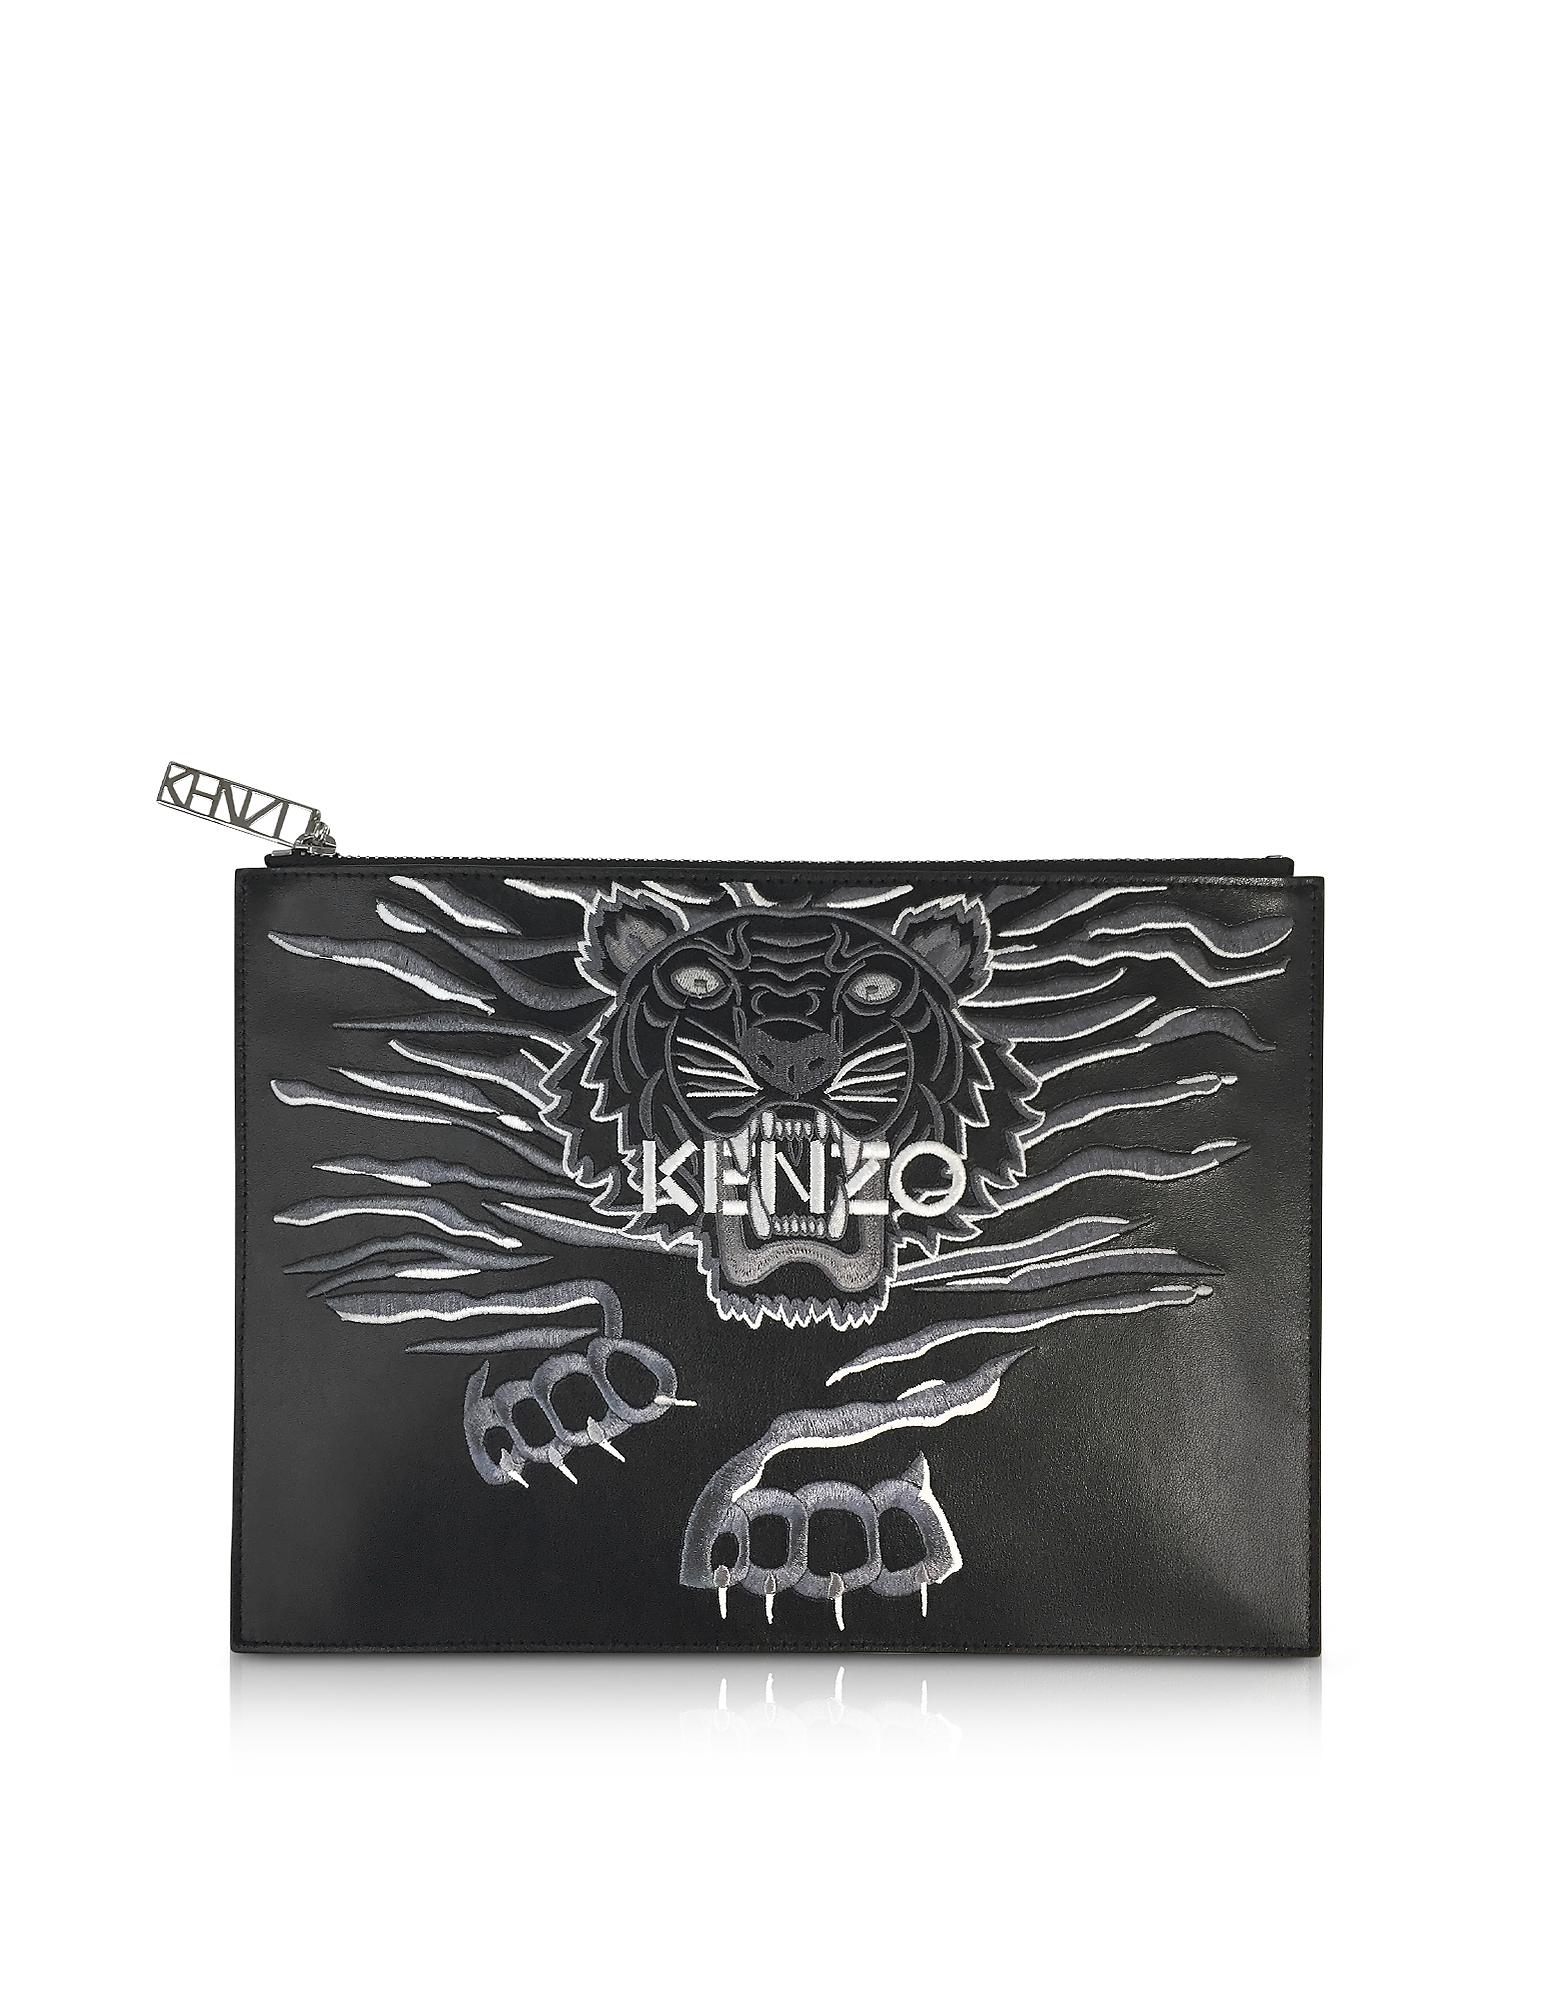 Kenzo Handbags, Black Leather A4 Geo Tiger Clutch